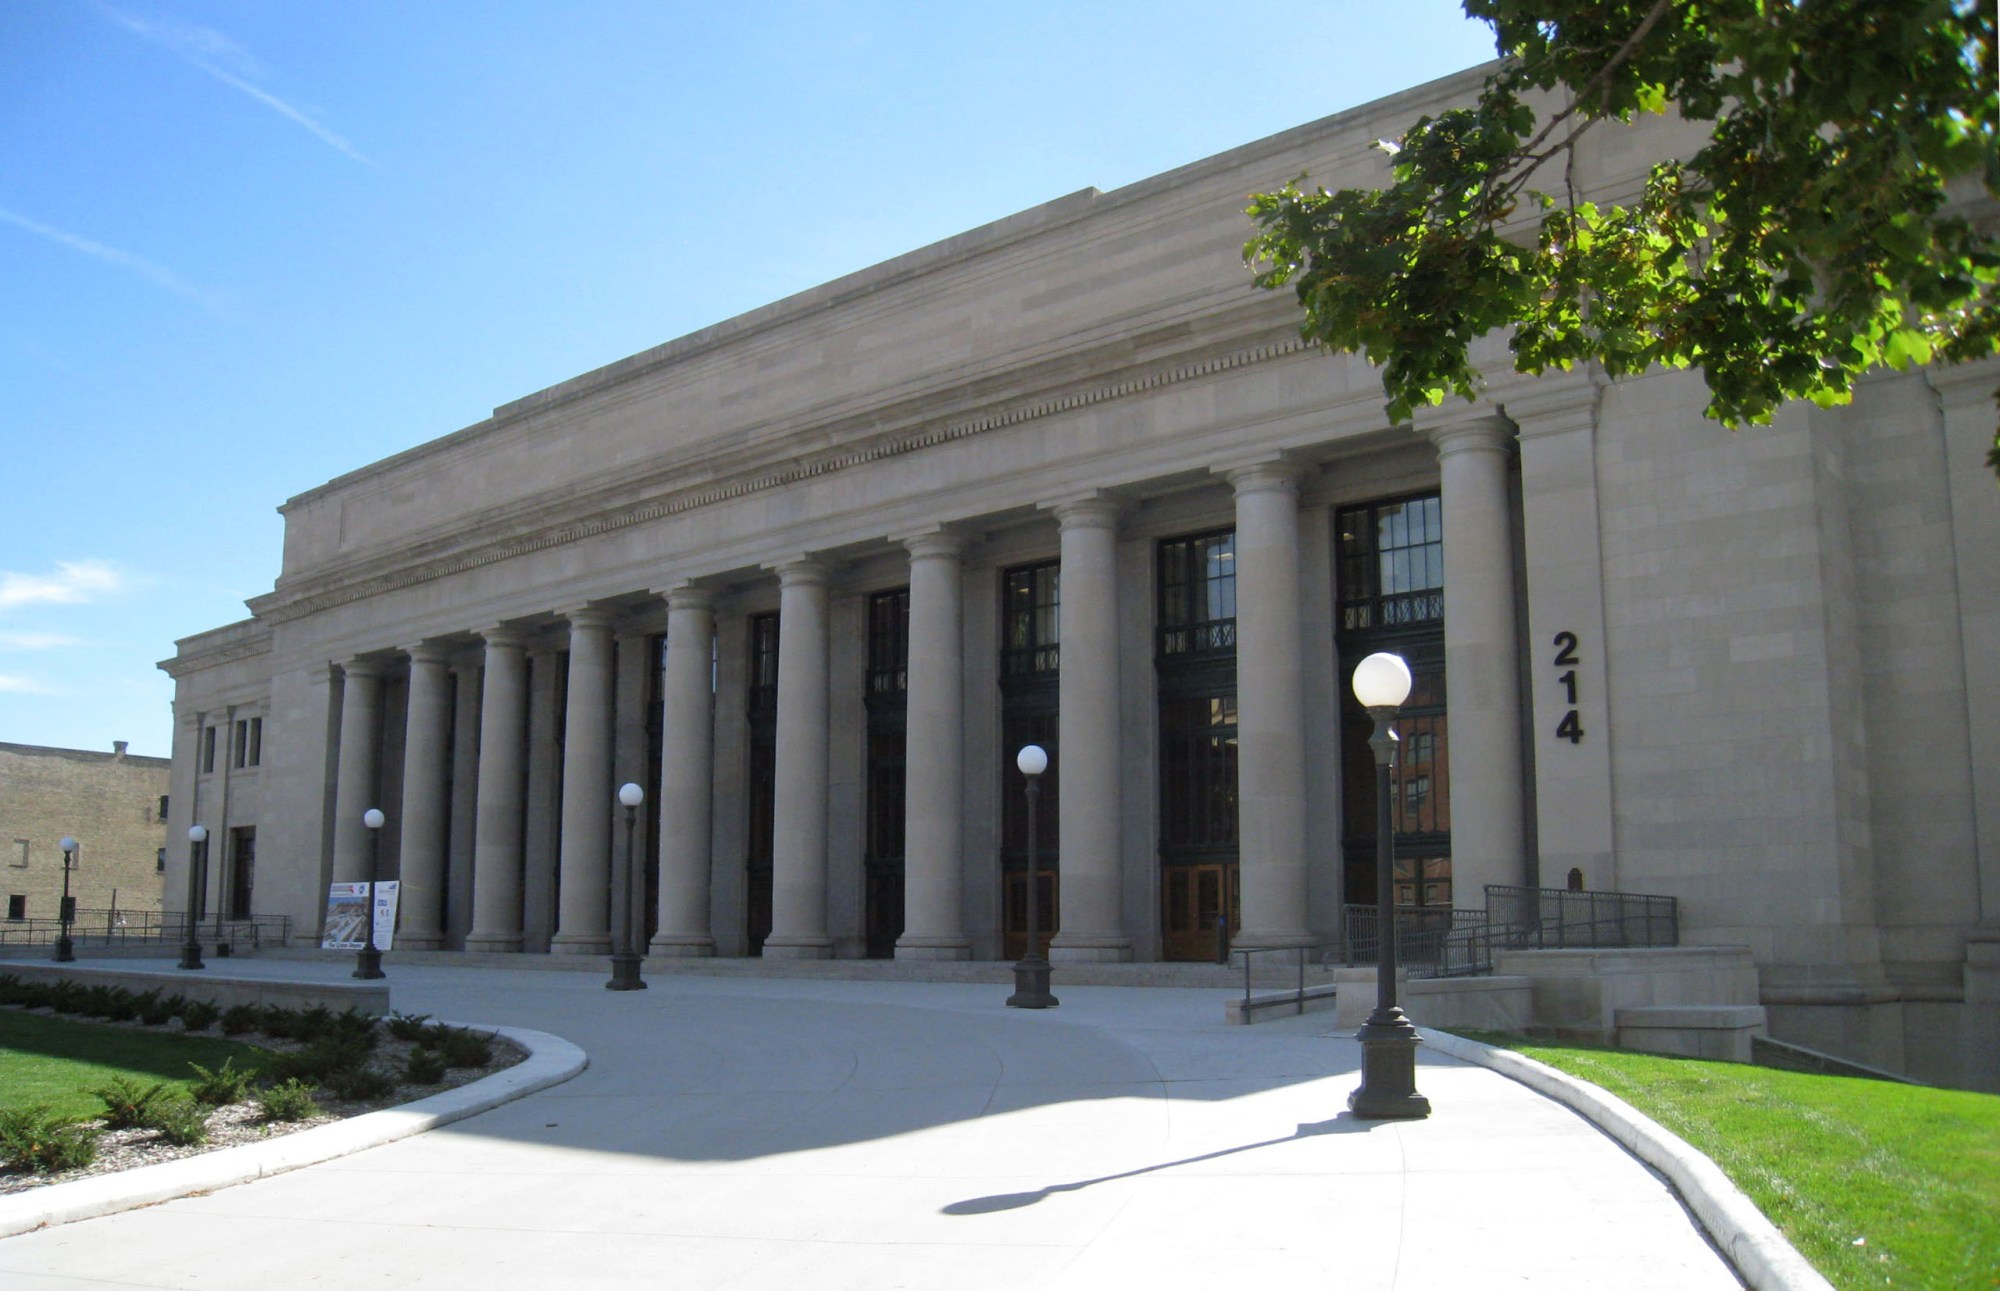 Union Depot in St. Paul, Minnesota